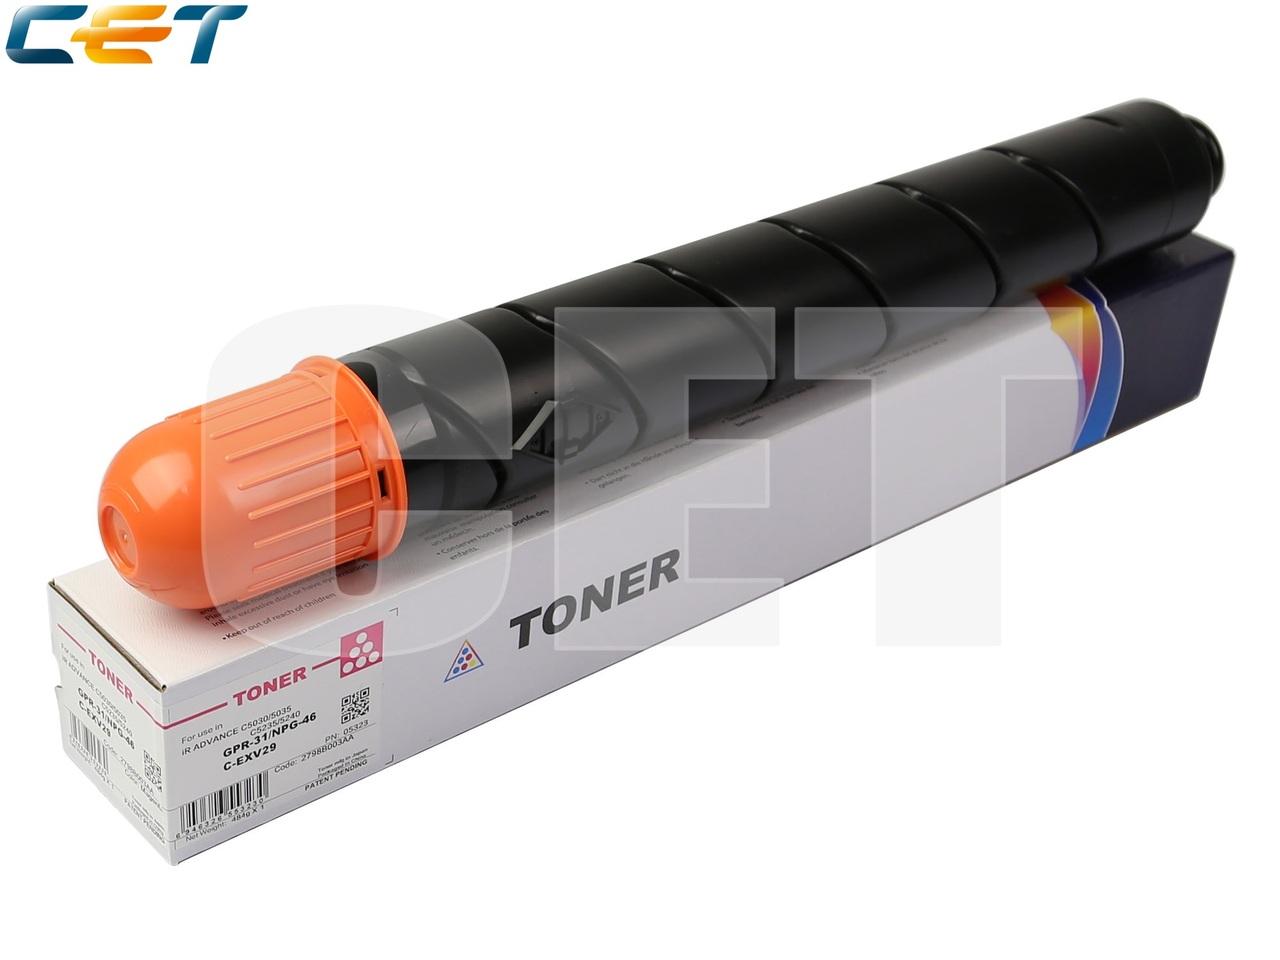 Тонер-картридж (CPP) C-EXV29 для CANON iR ADVANCEC5030/C5035/C5235/C5240 (CET) Magenta, 484г, 27000 стр.,CET5323